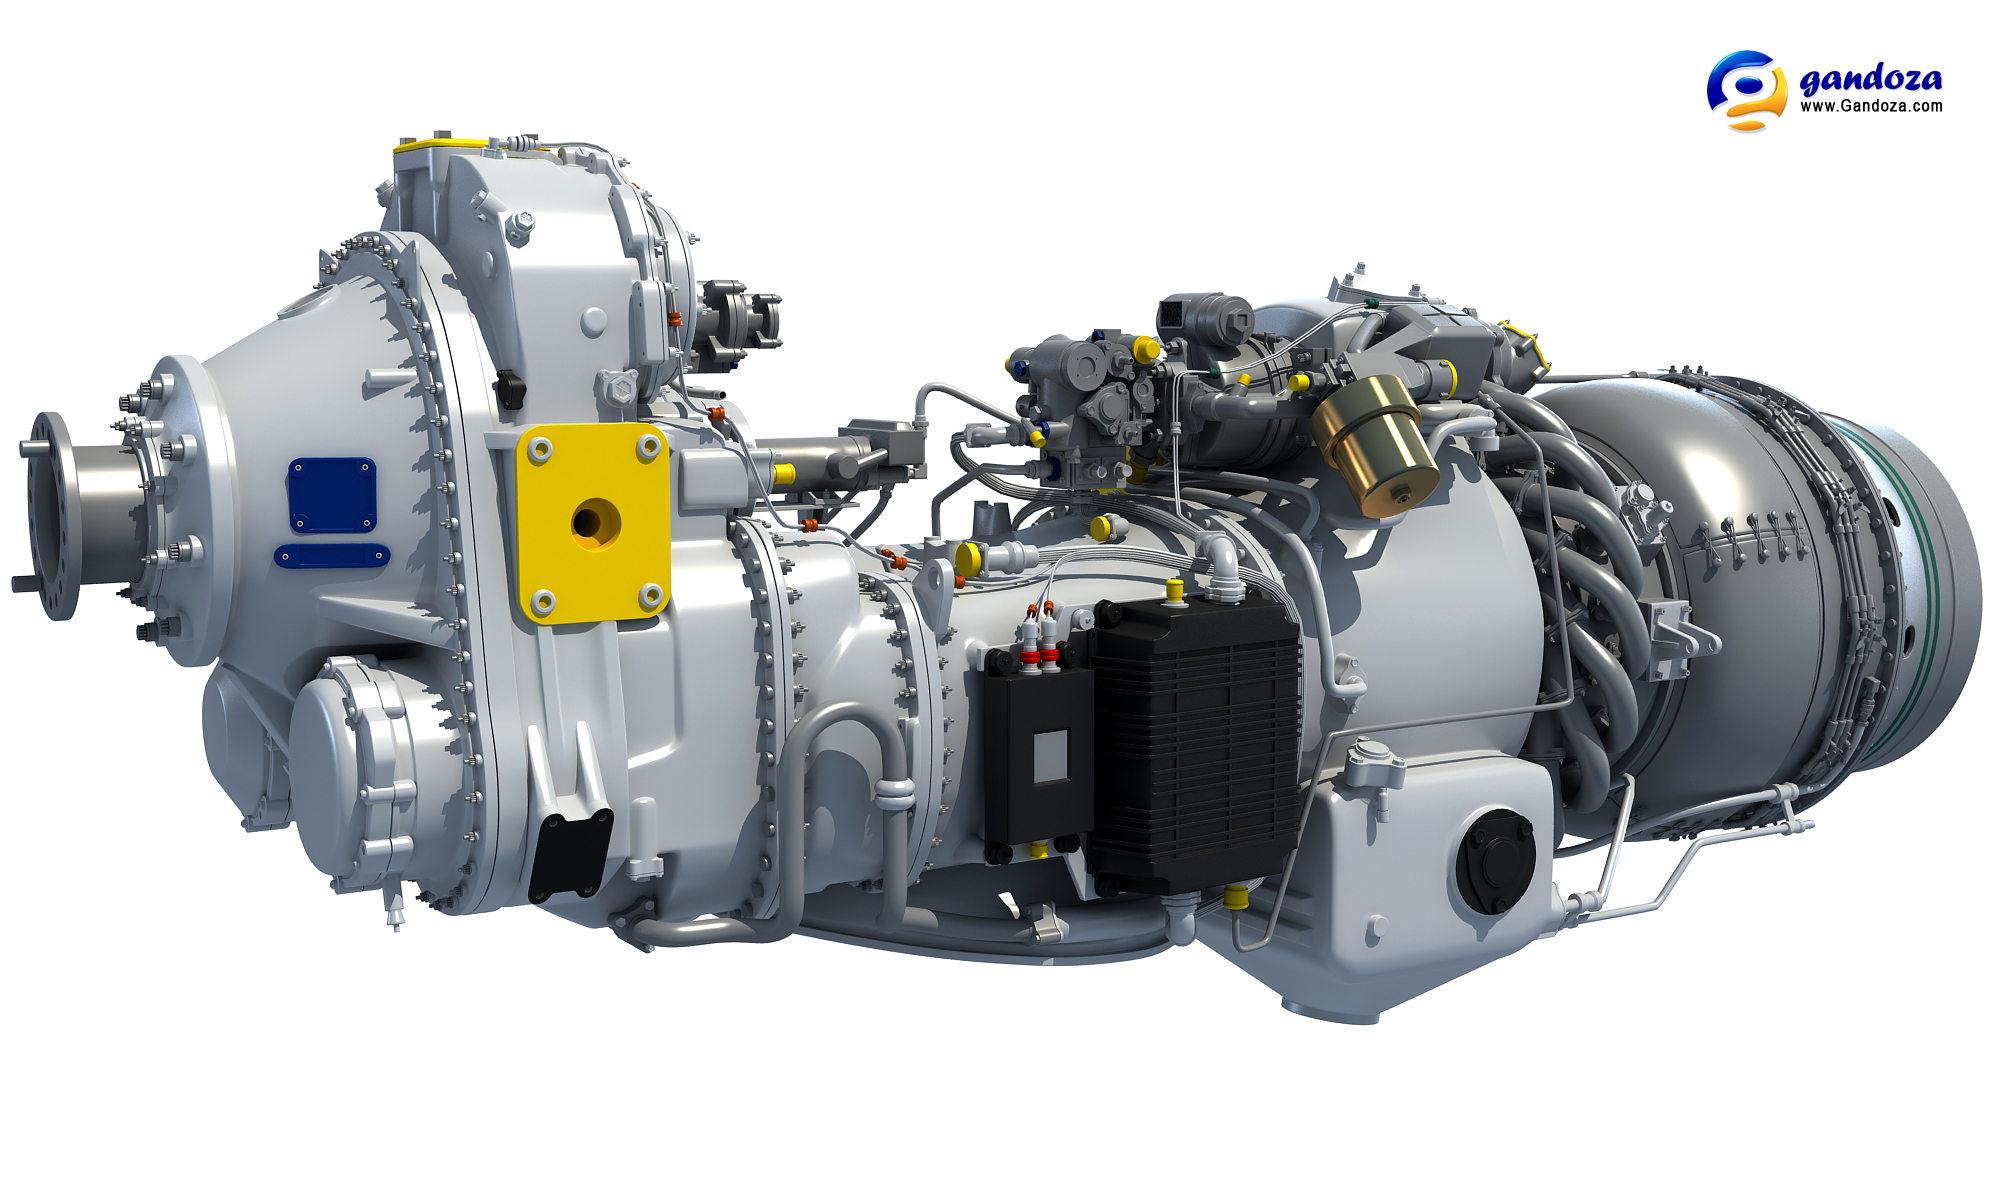 PW100 Turboprop Engine 3D Model by Gandoza